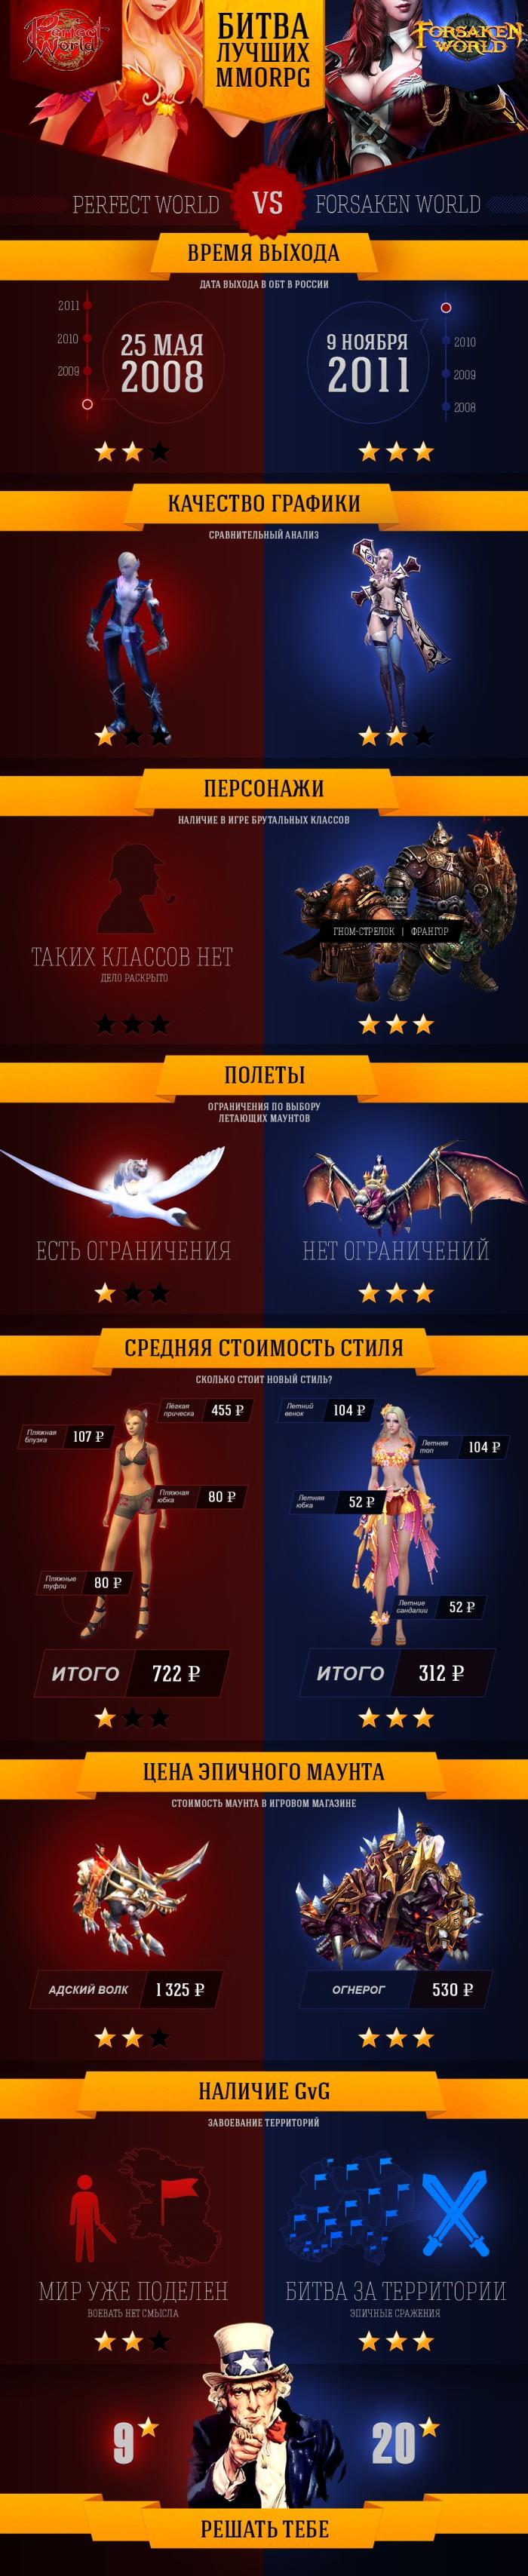 Битва лучших MMORPG